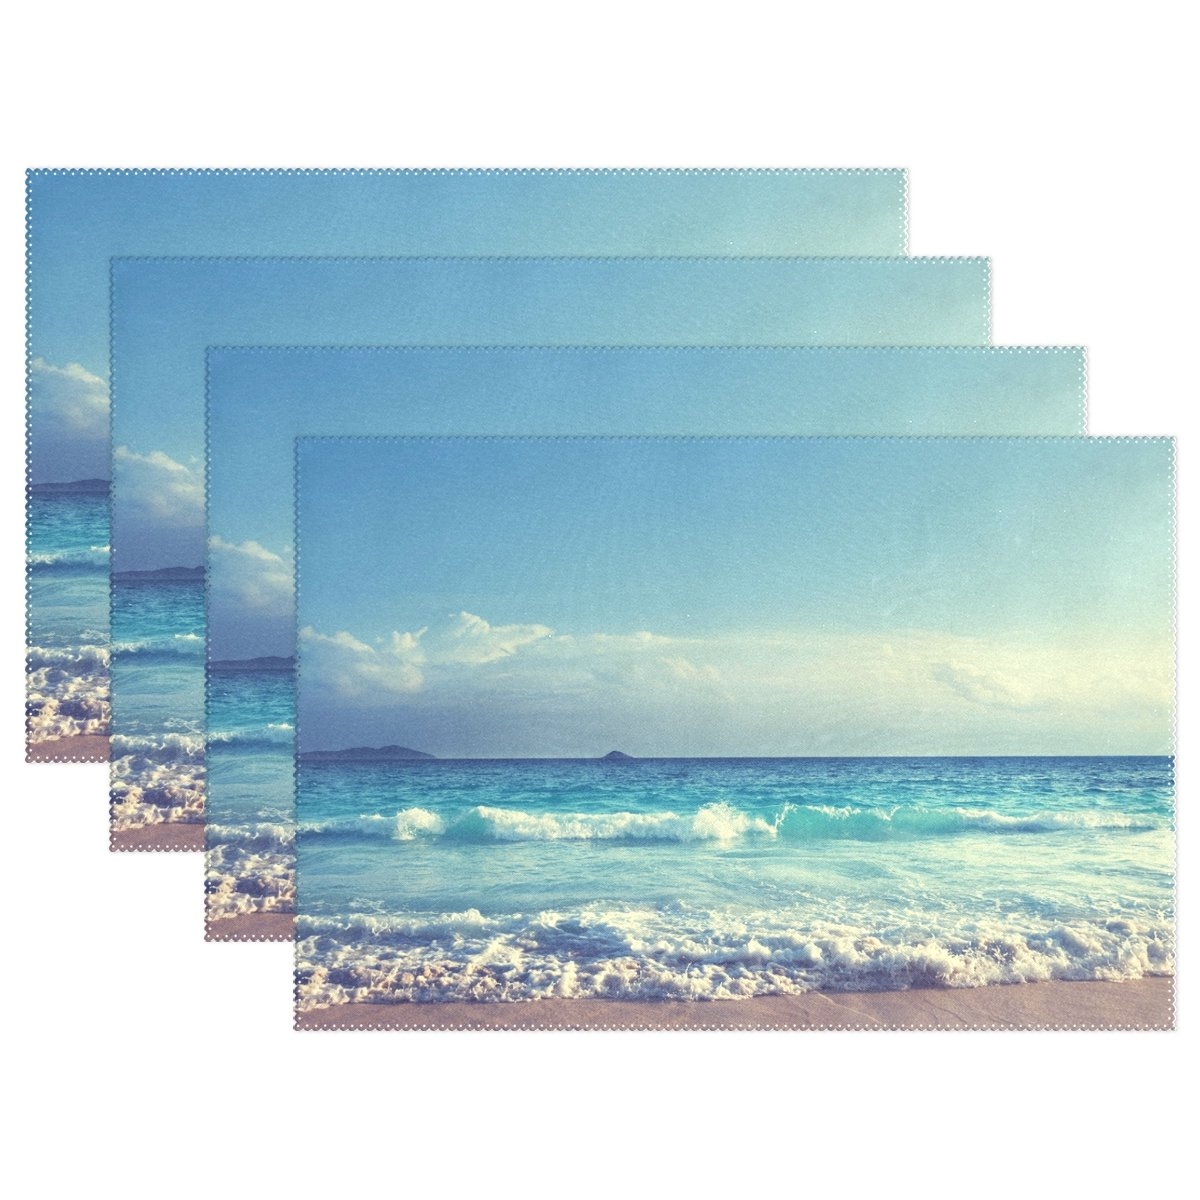 WozoブルーSky Ocean Wave Seaプレースマットテーブルマット、美しい自然風景12